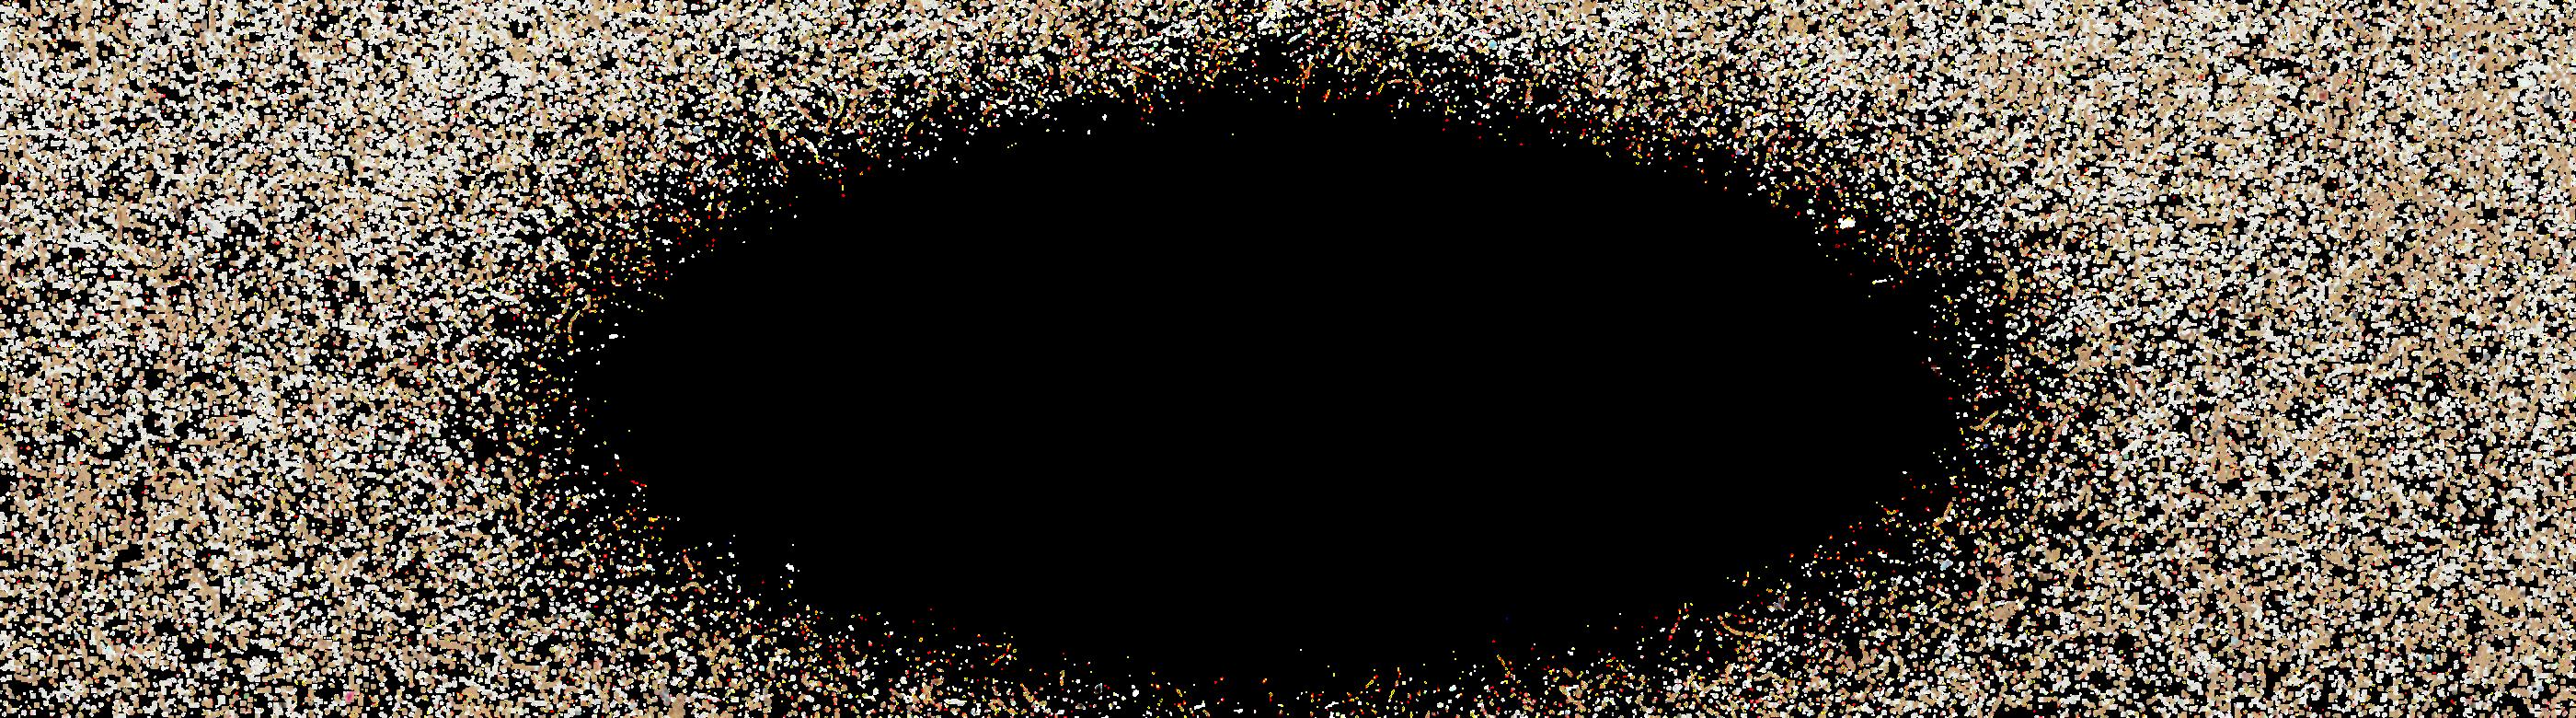 texture-image